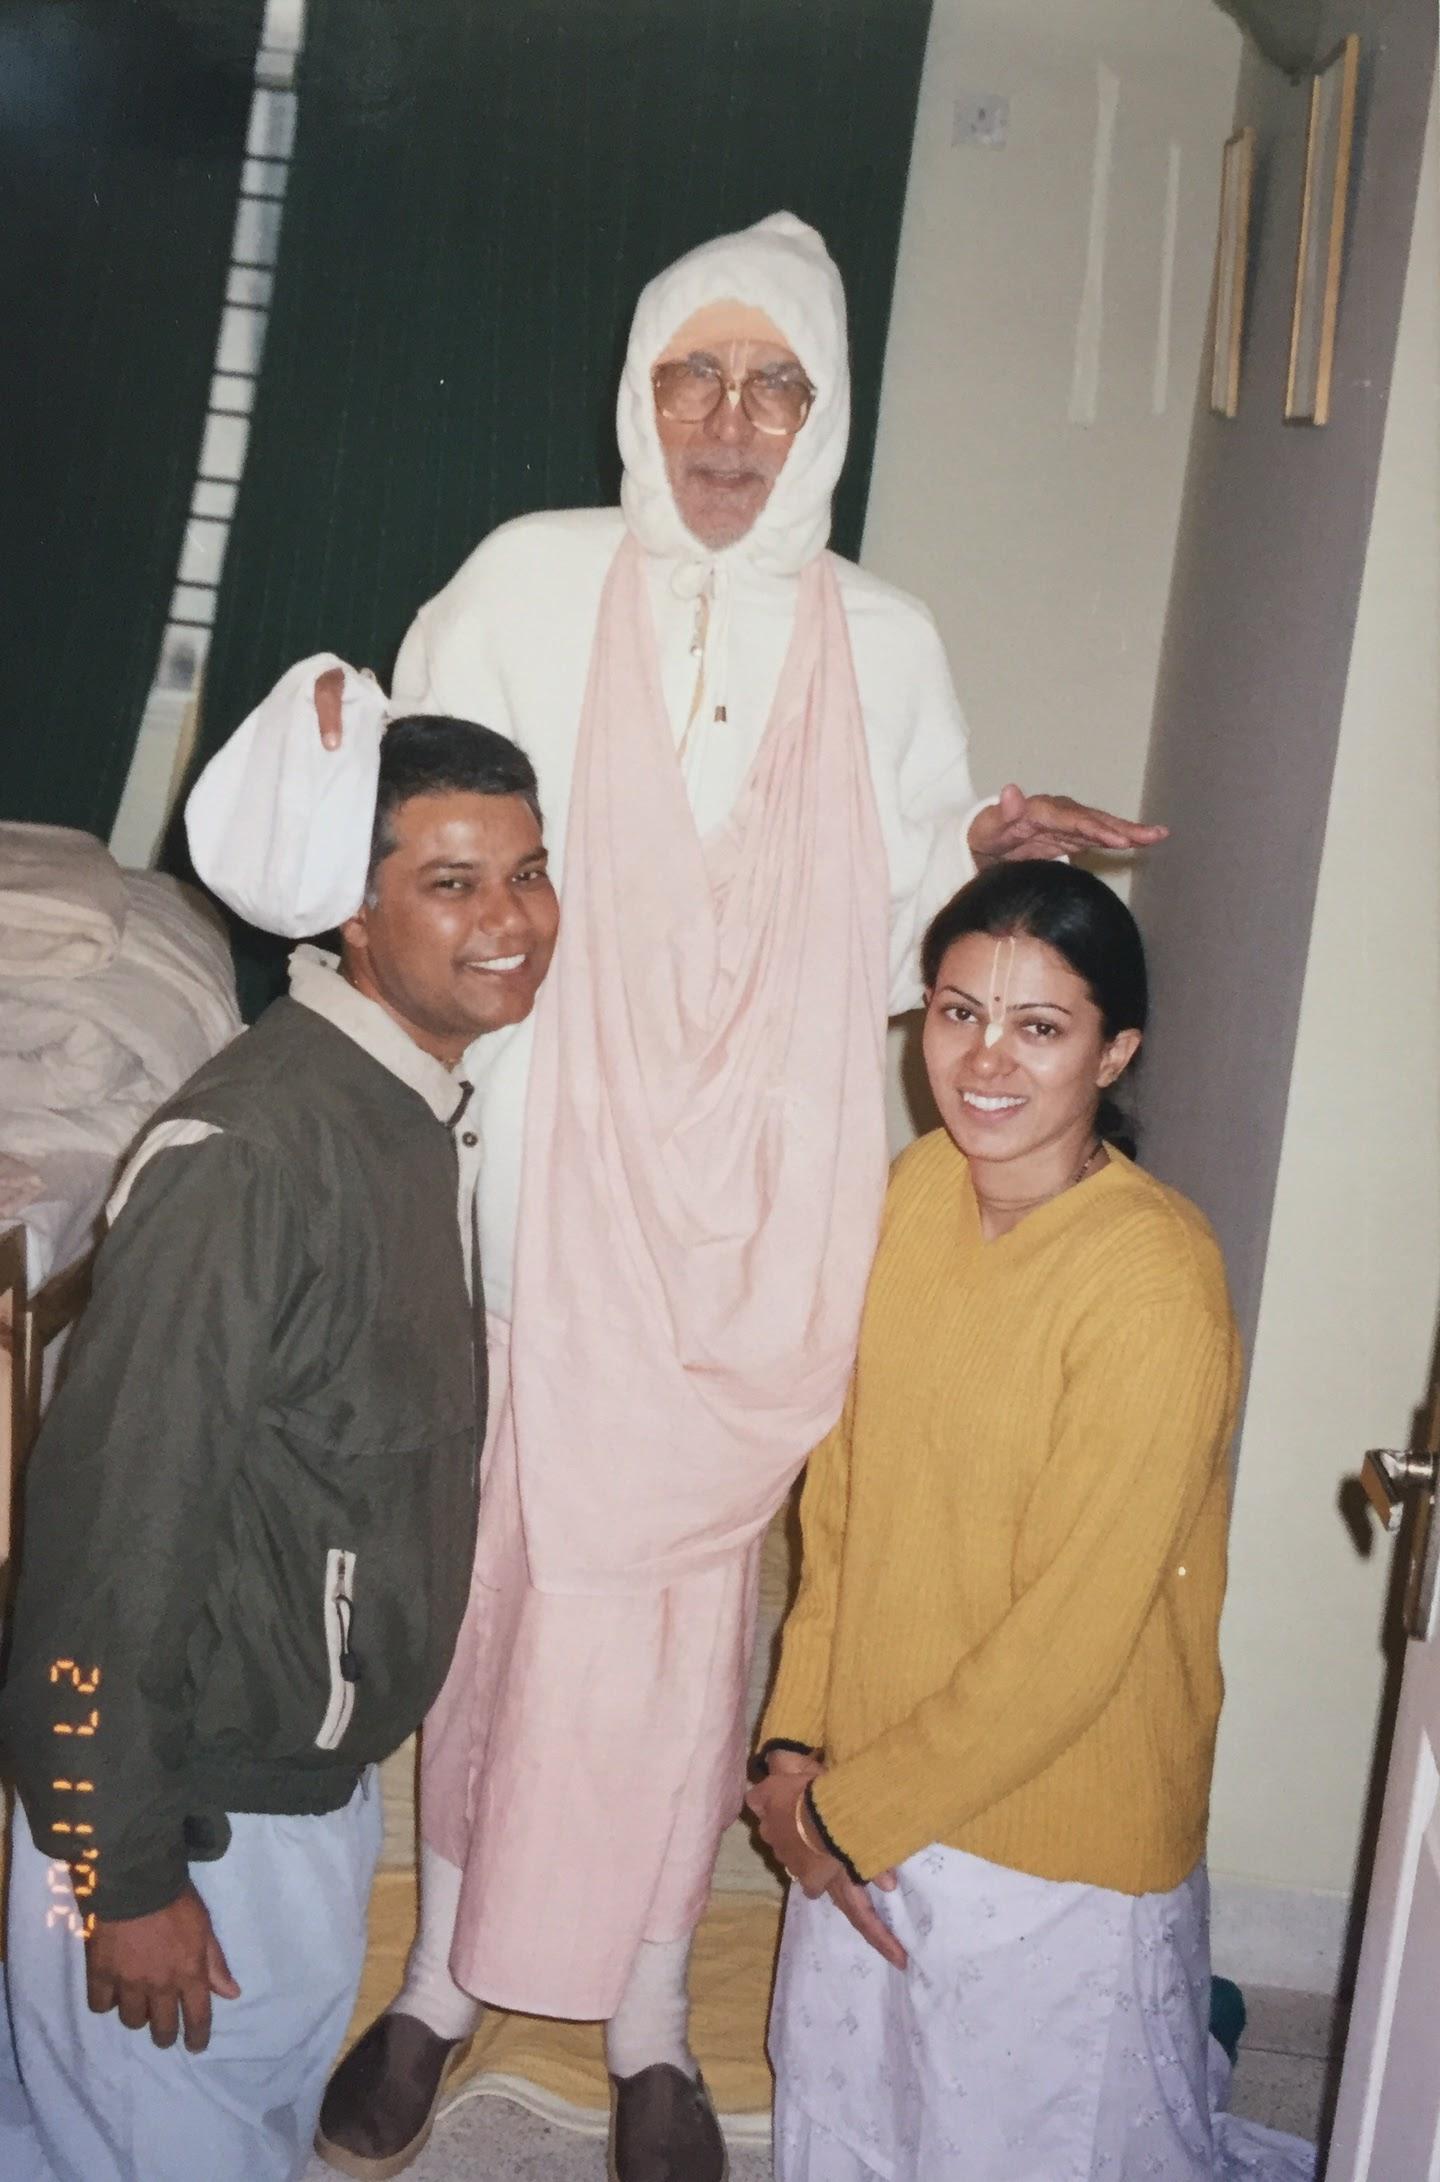 Srila Gurudeva ki Jai!